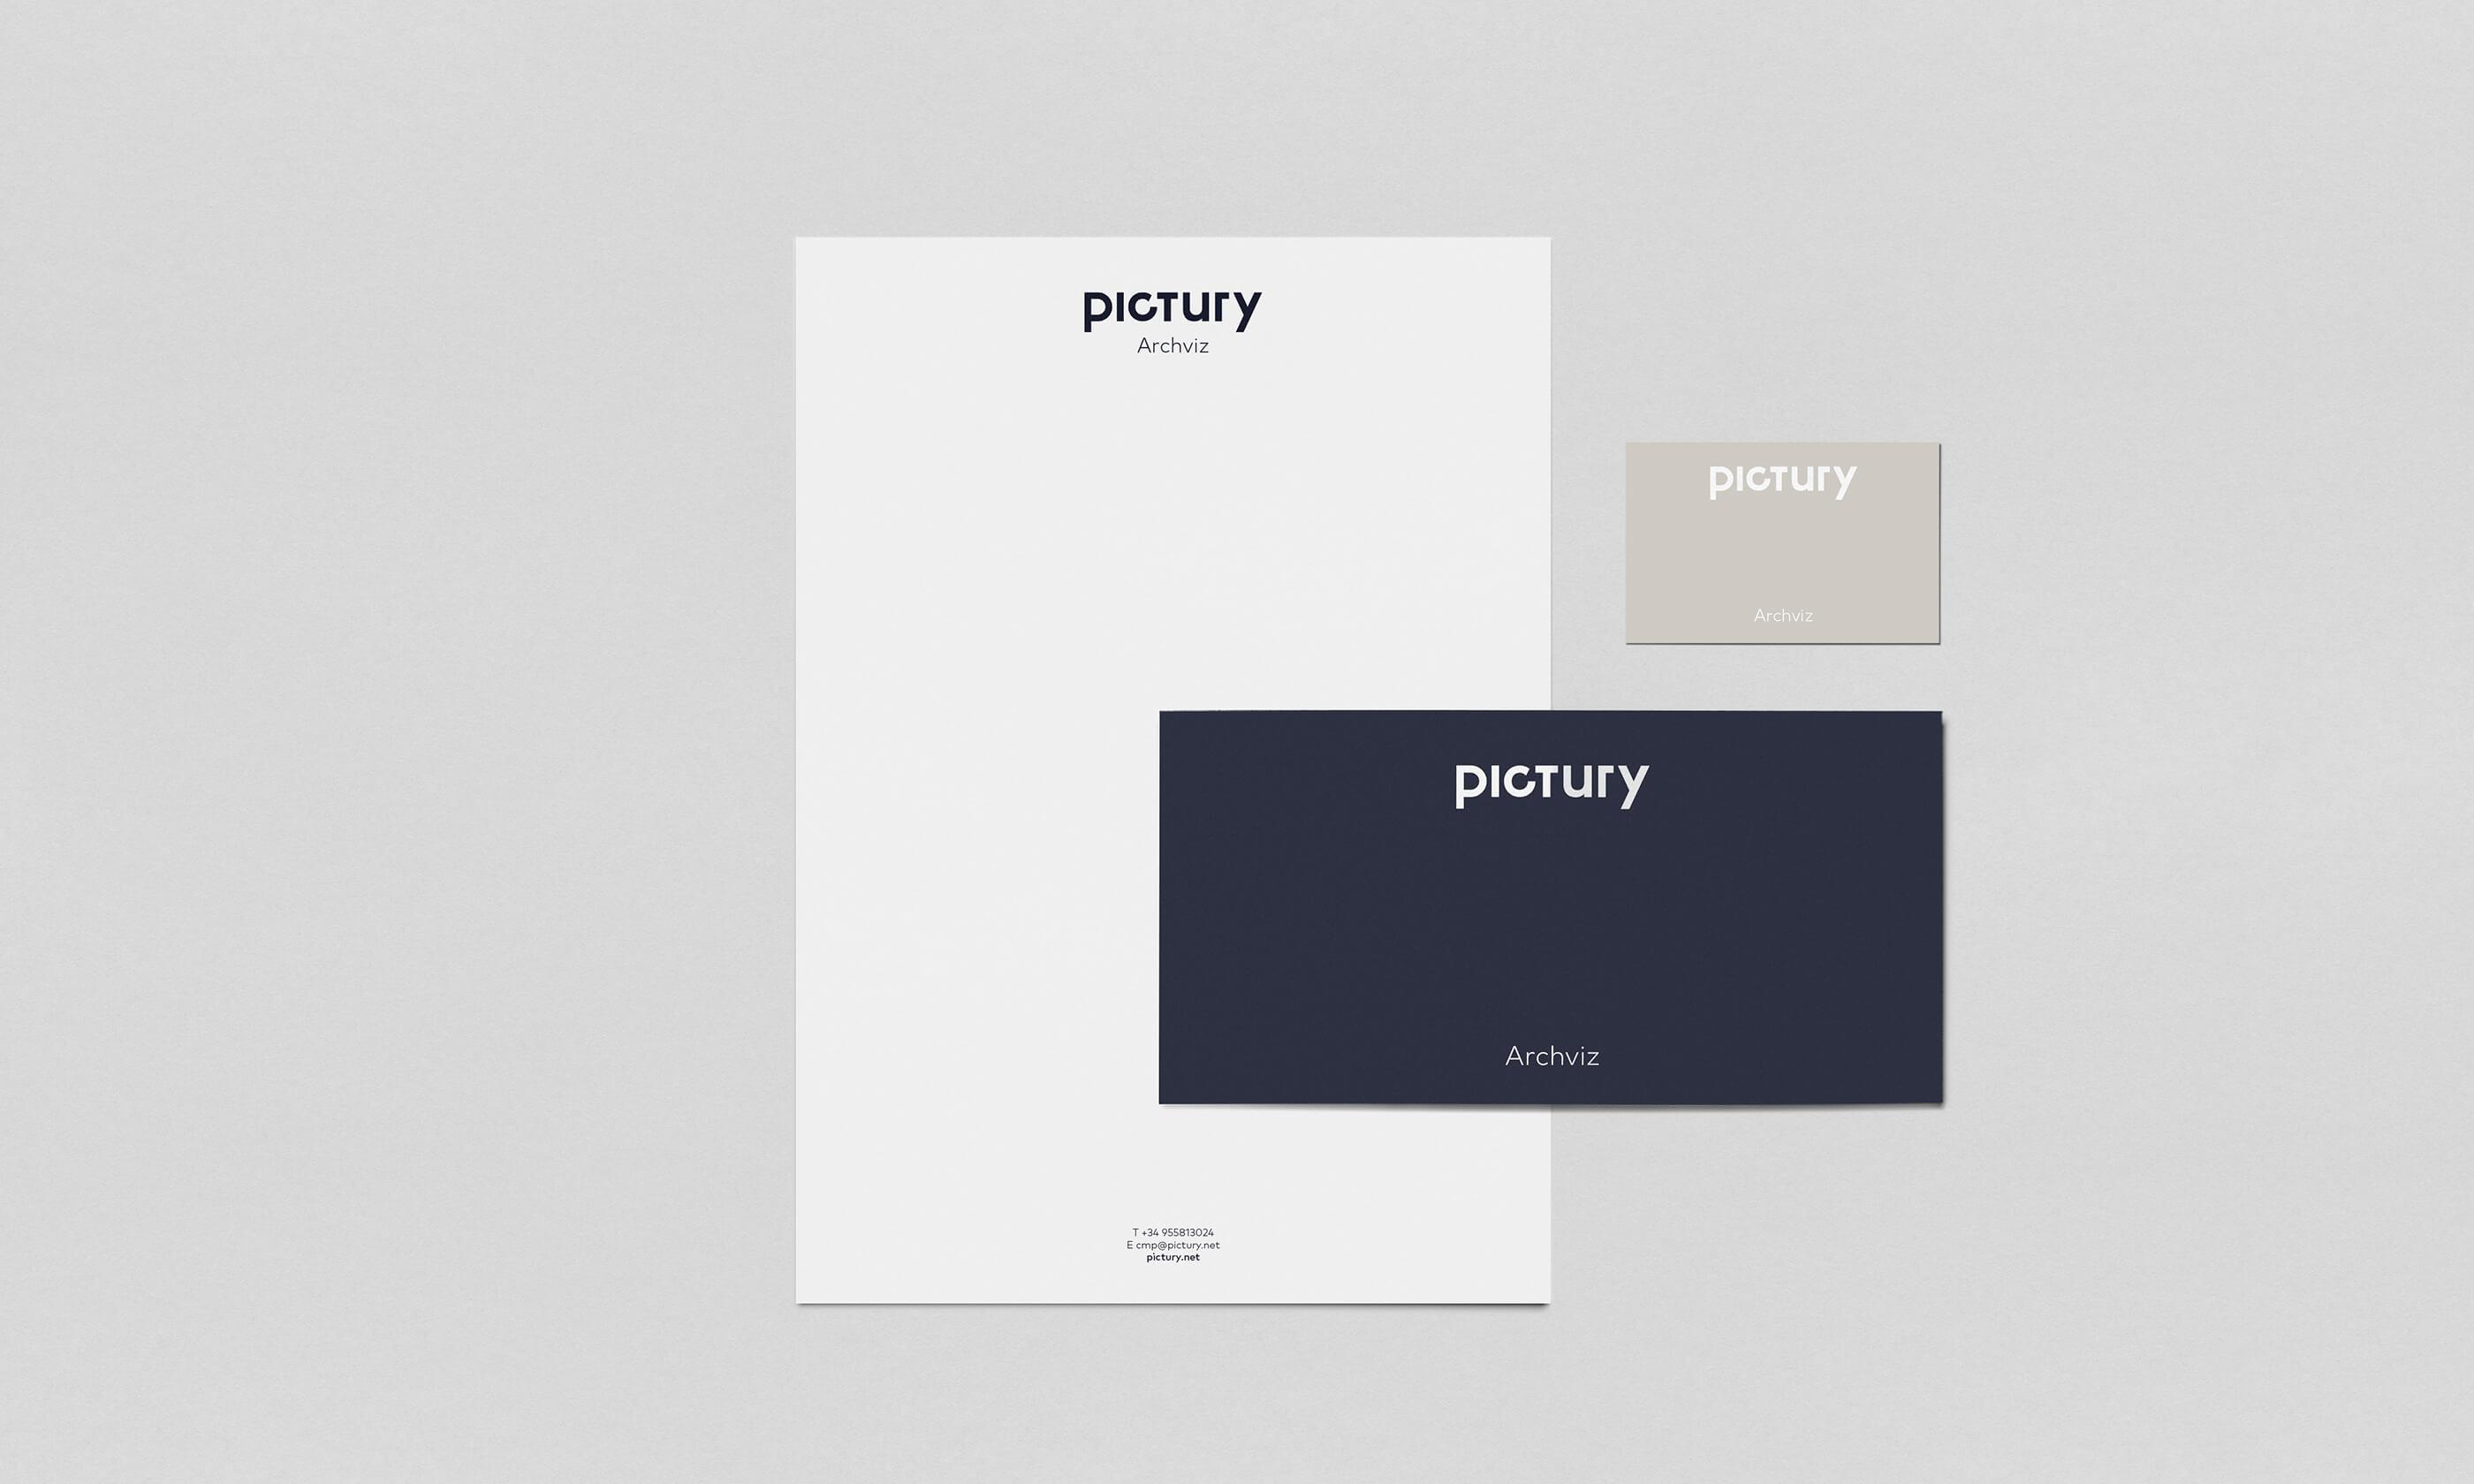 Pictury 7